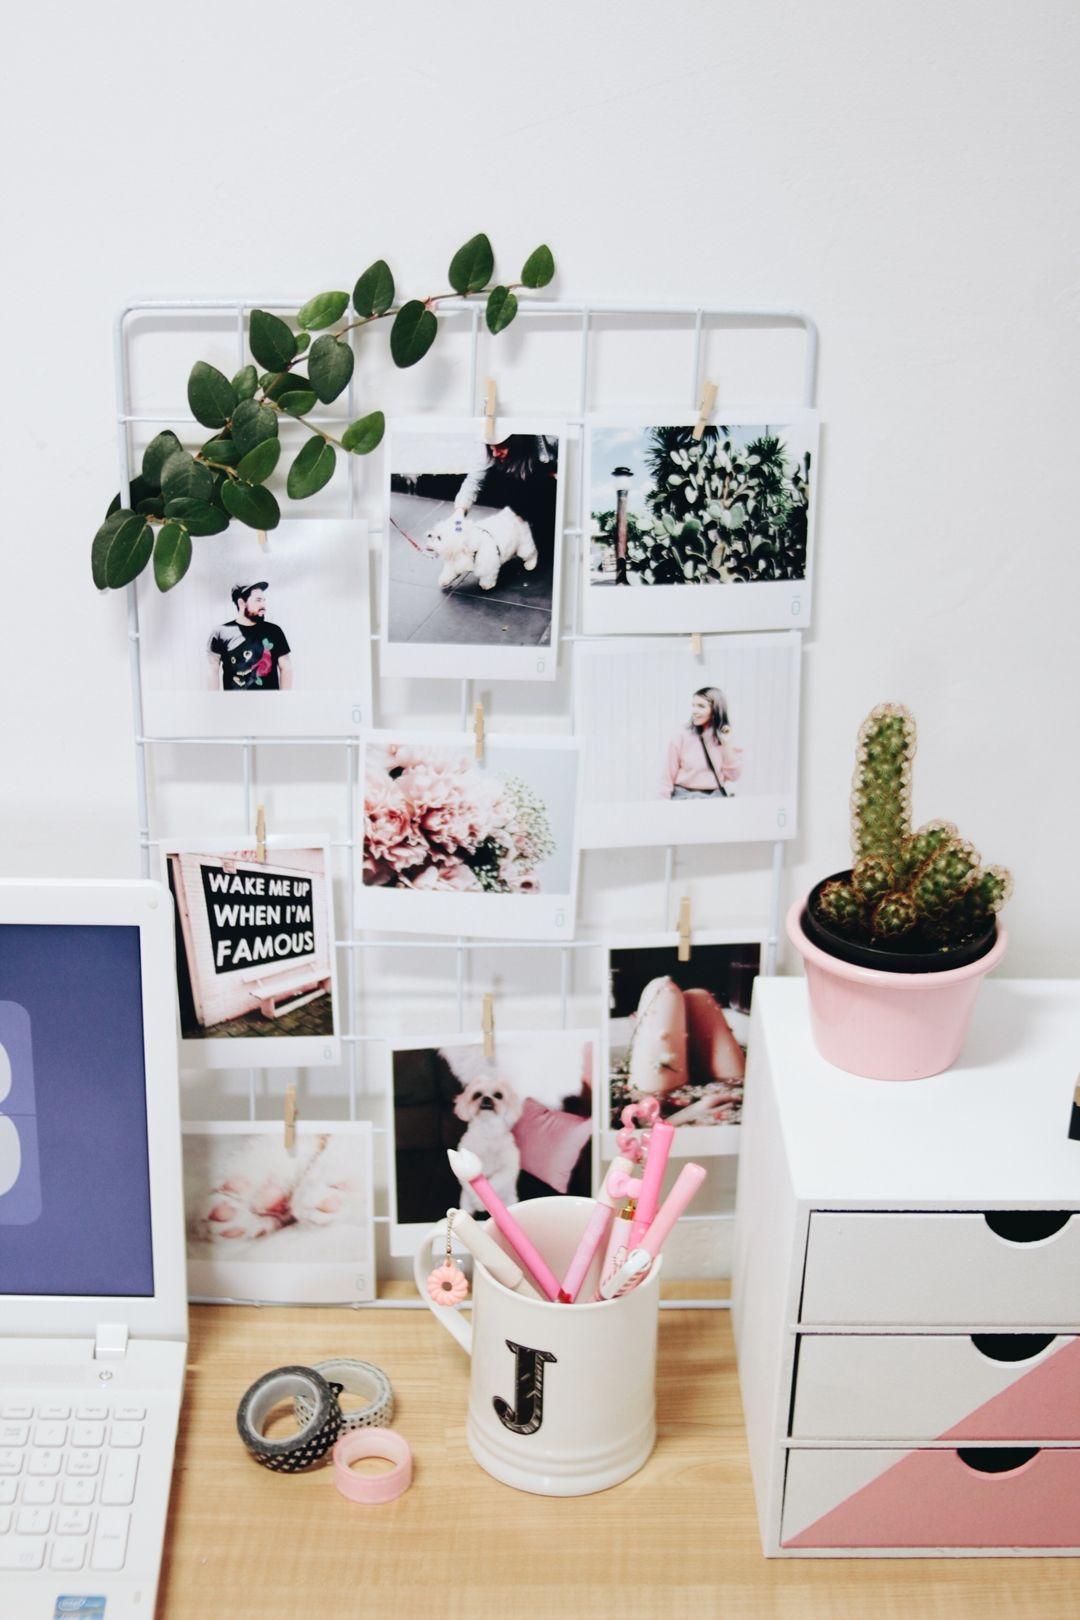 Elegant Rosa Graue Schlafzimmer · Traumzimmer · Tumblr Wanddekoration · Video 4 Diy  Com Fotos Inspirados No Pinterest E No Tumblr Para Decorar Sua Casa3